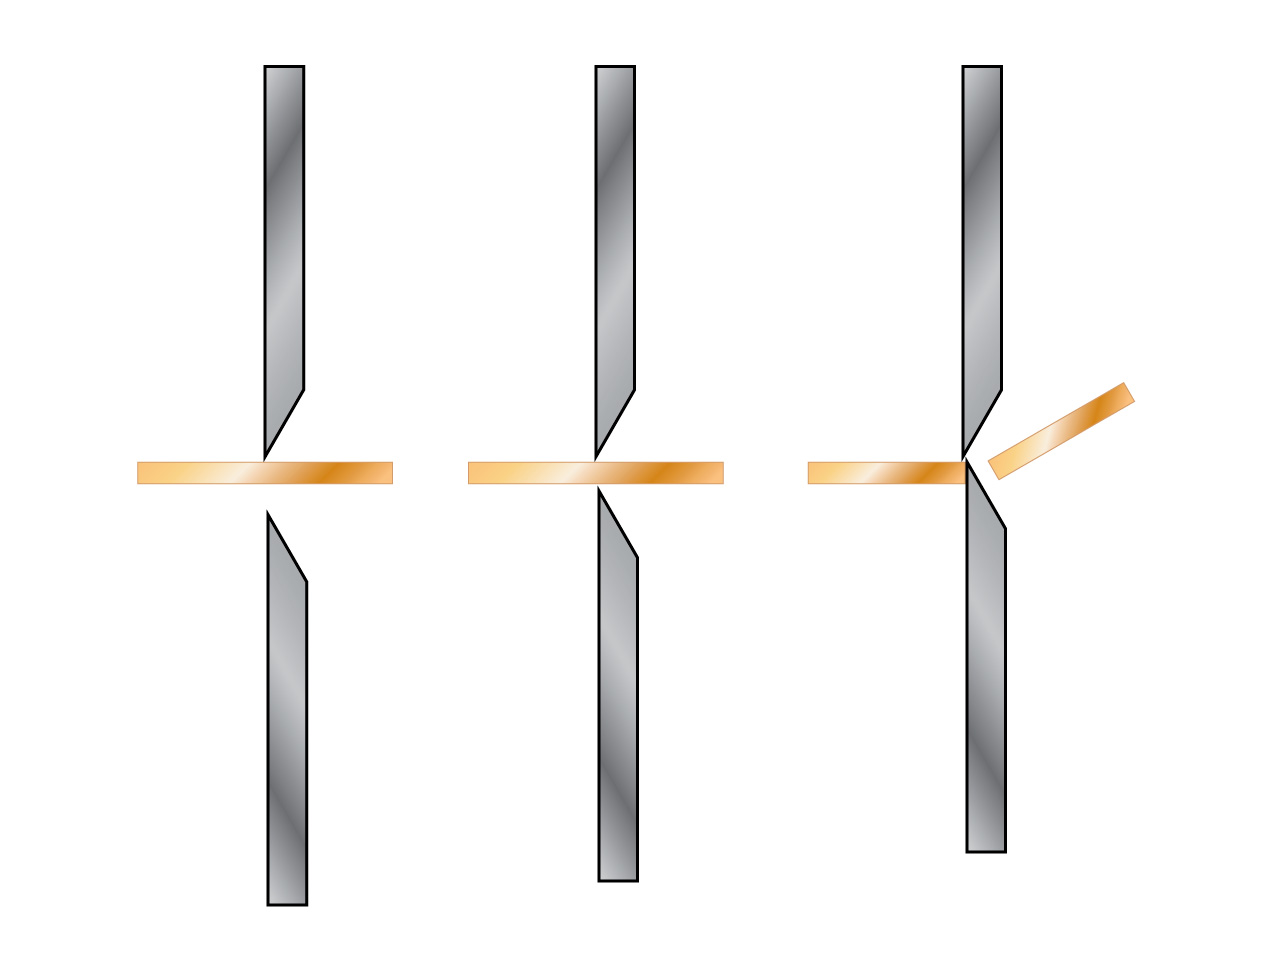 Xuron-Multi-Purpose-Pliers-Cutters-Shears-and-Scissors thumbnail 13